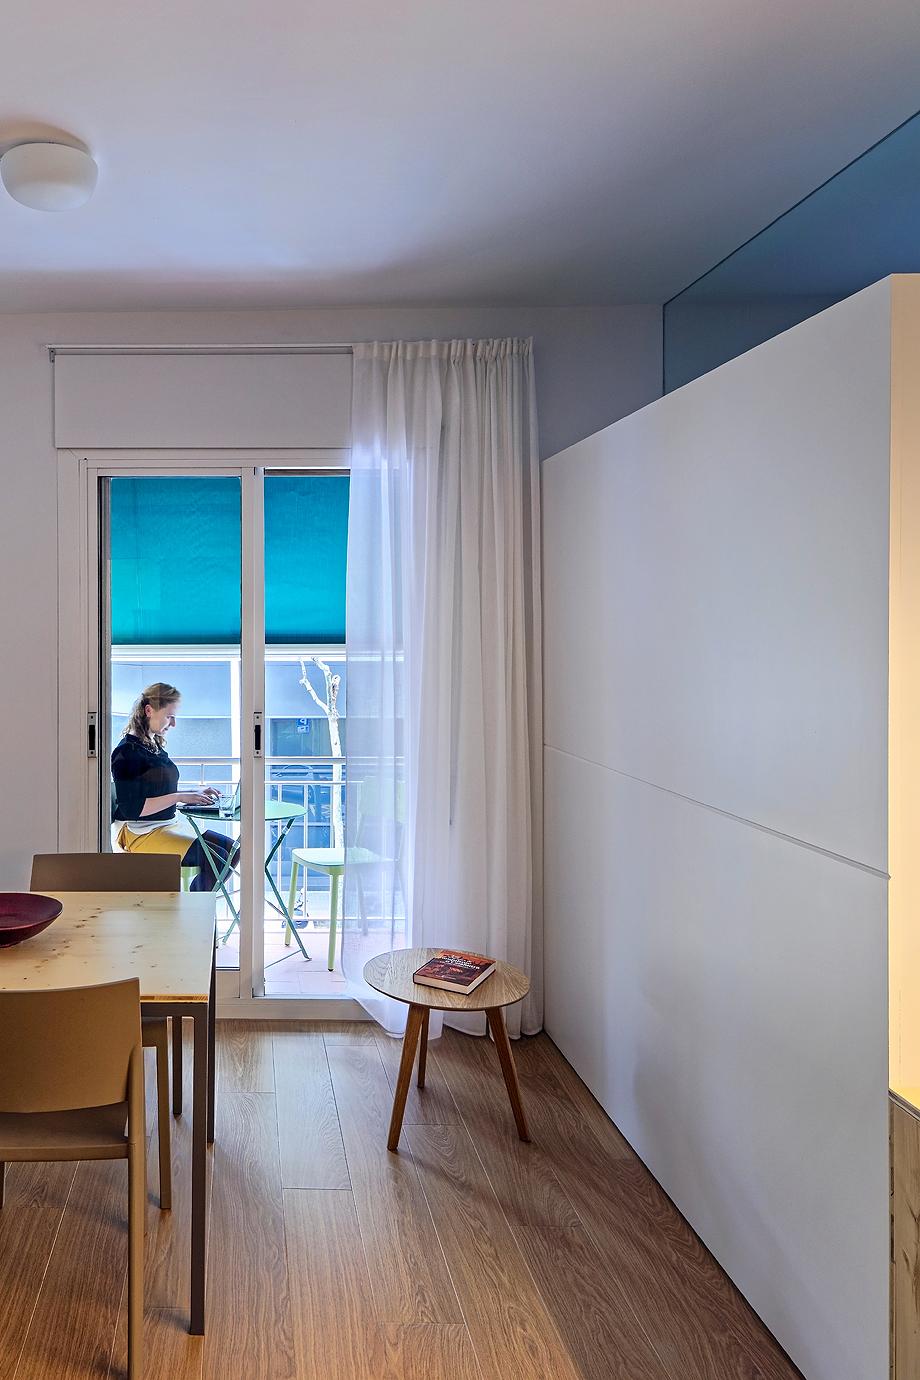 vivienda de alquiler diseño low cost agusti costa (16)